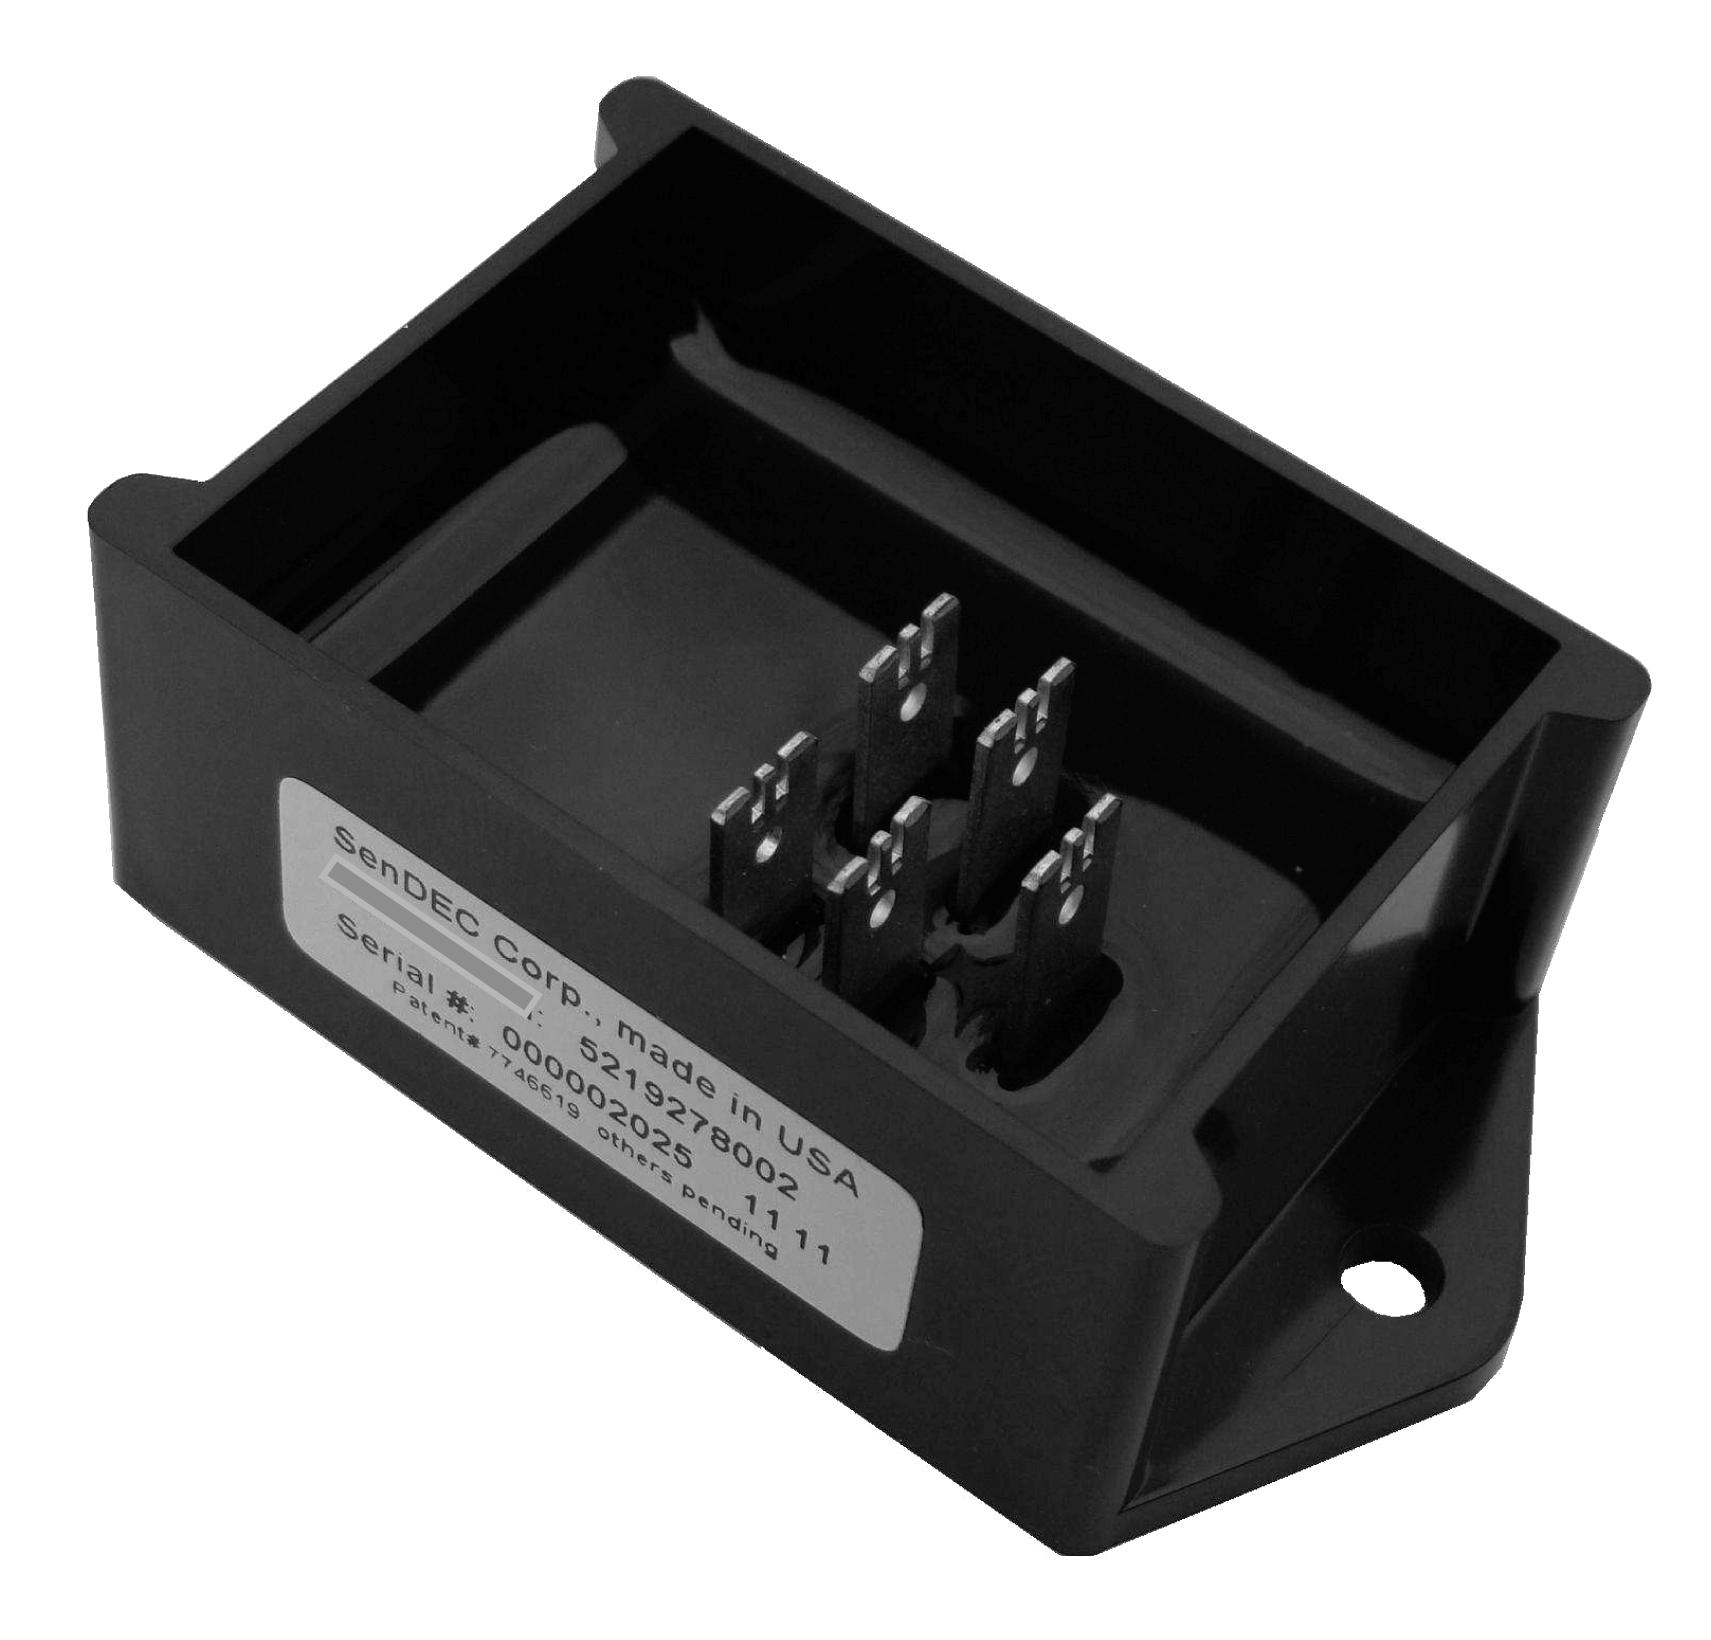 GDI SoftStart Clutch Controller